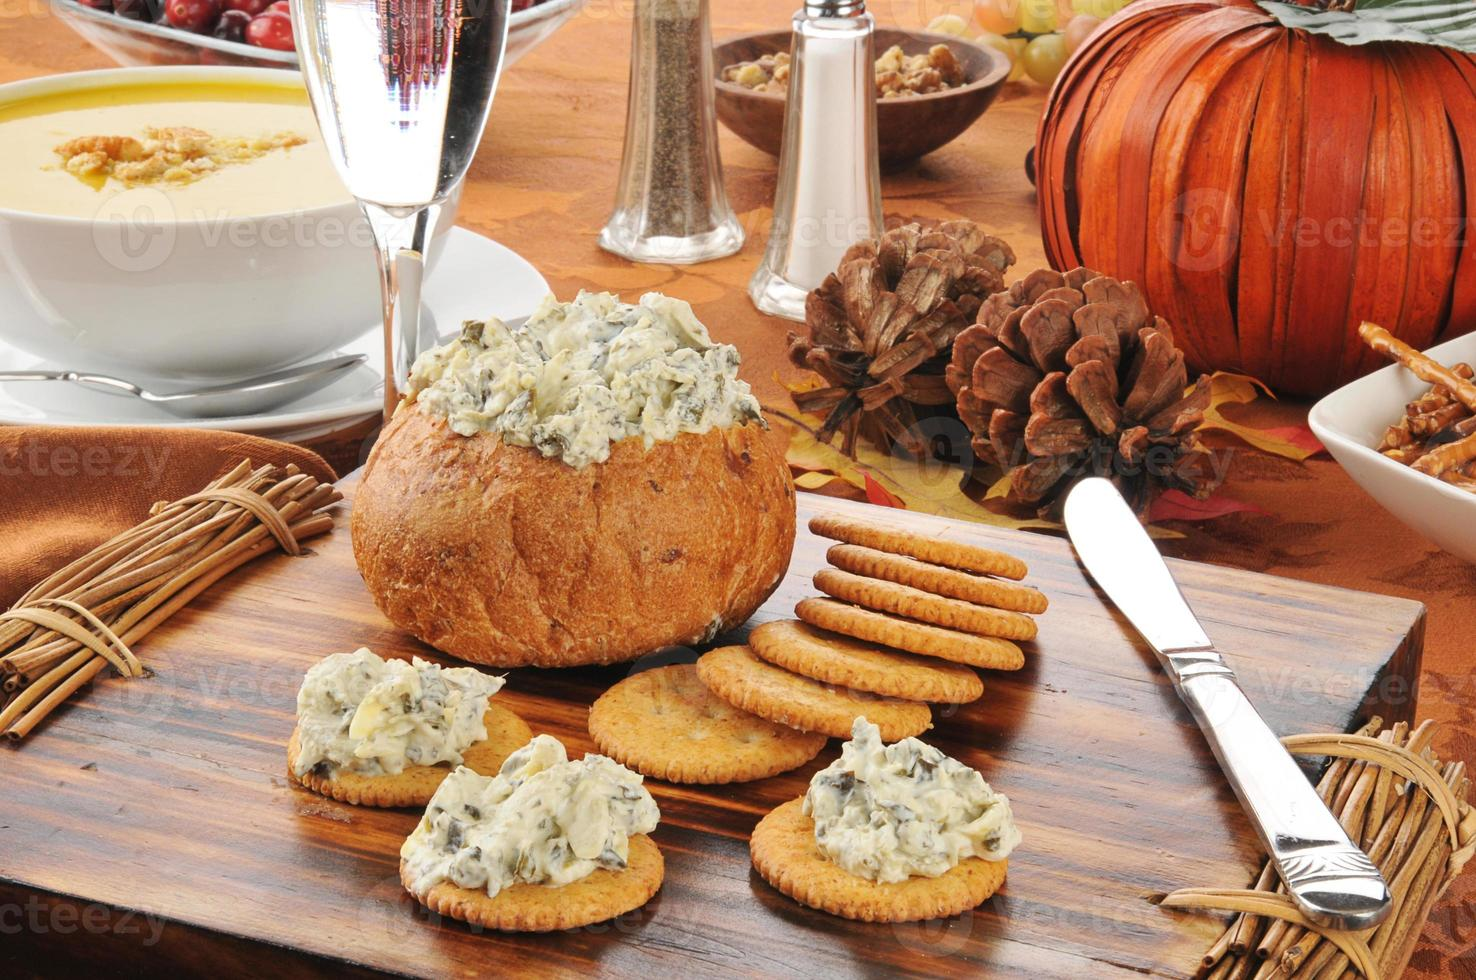 comidas festivas foto